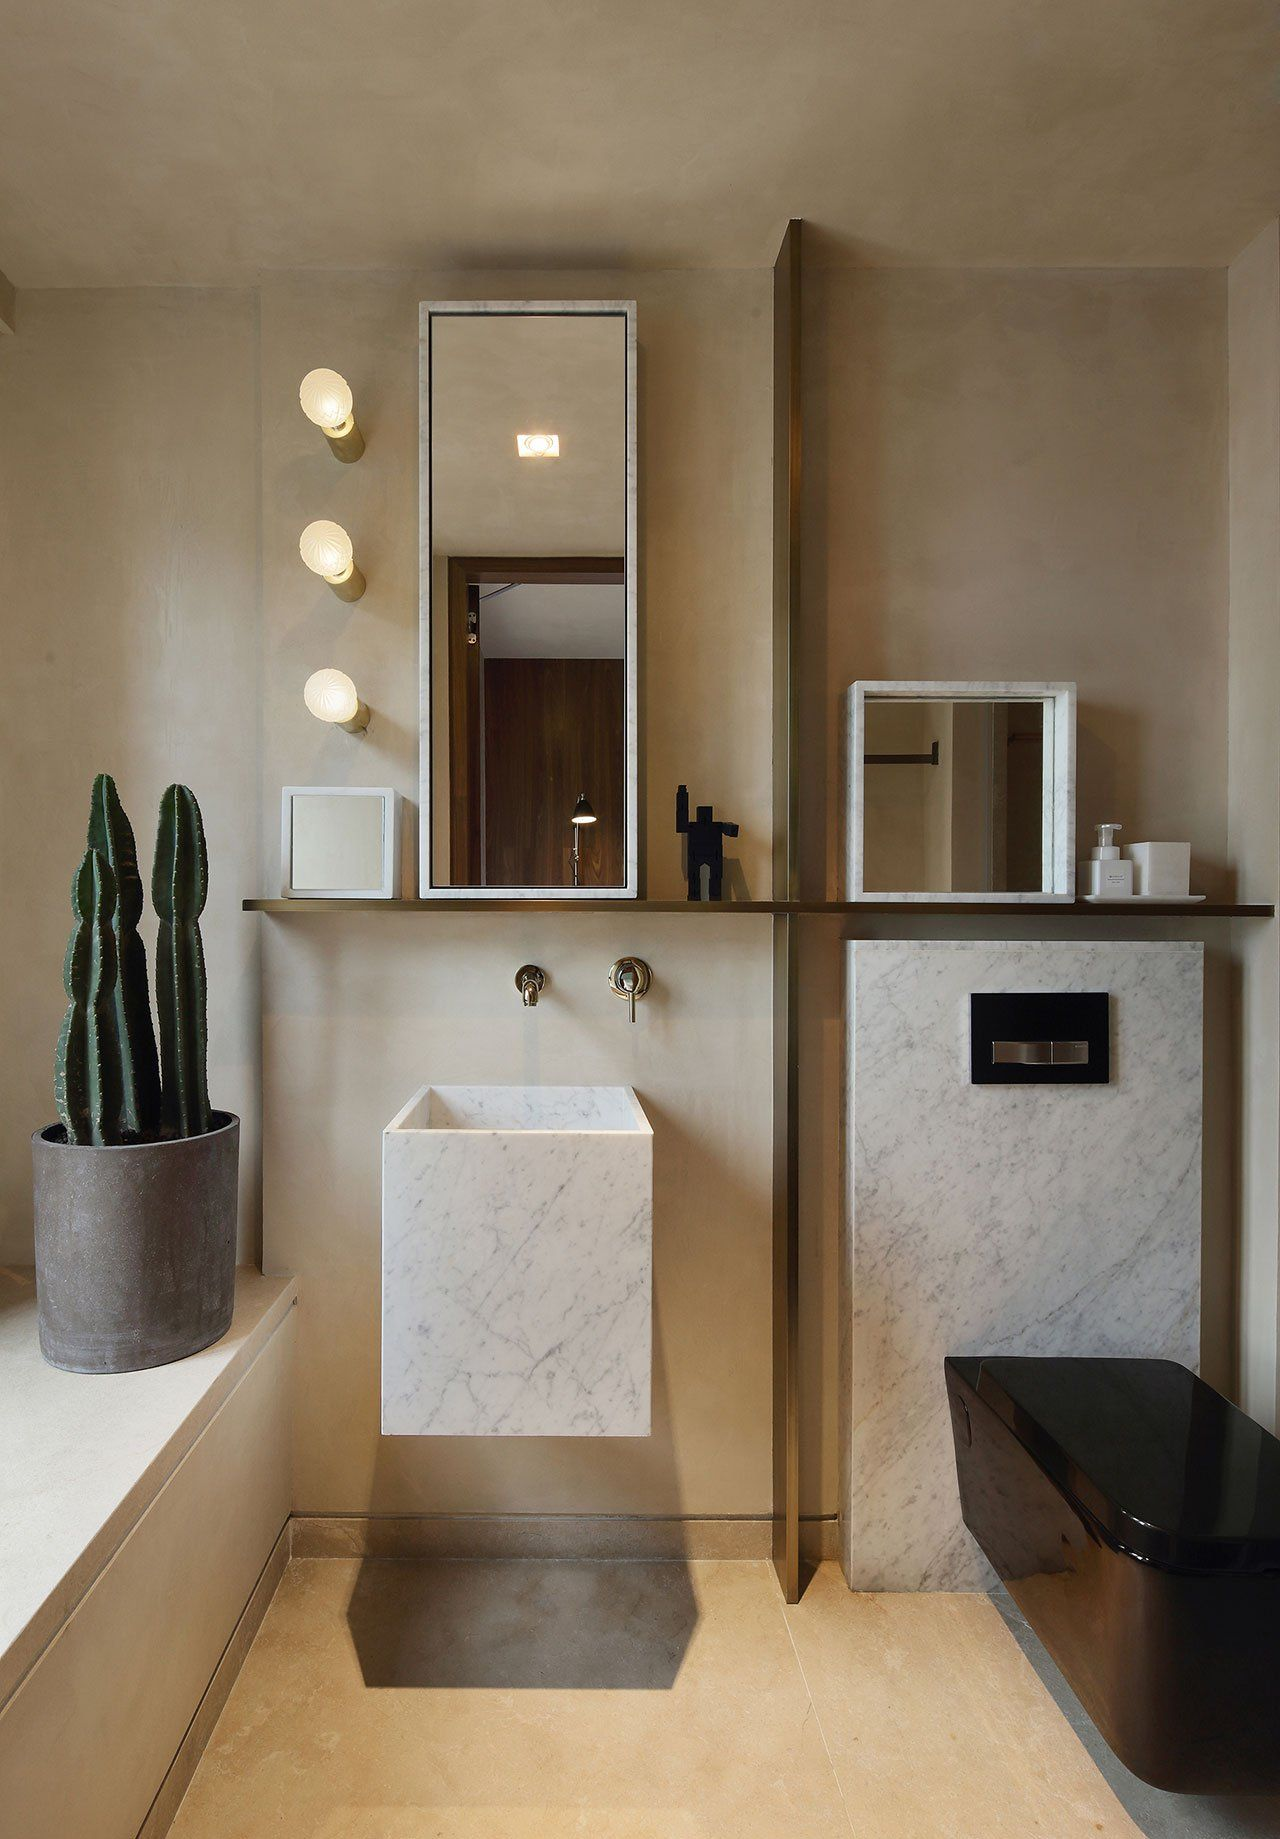 Aesthetic Modern Bathroom Interior Design Idas For Wall Art Small Bathroom Makeover Bathroom Design Small Bathroom Interior Design